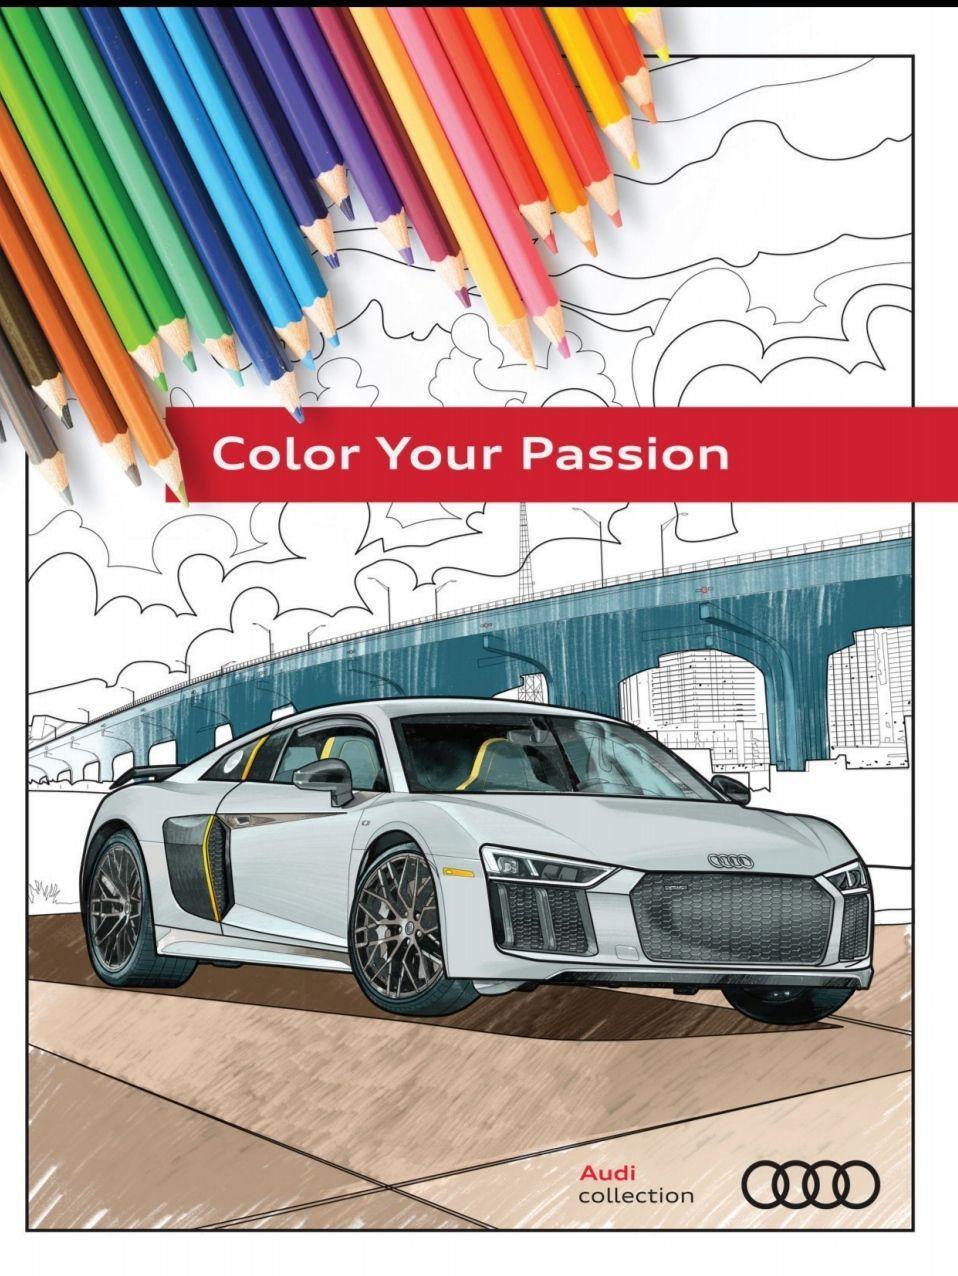 Audi Coloring Book - Kolorowanka samochodowa